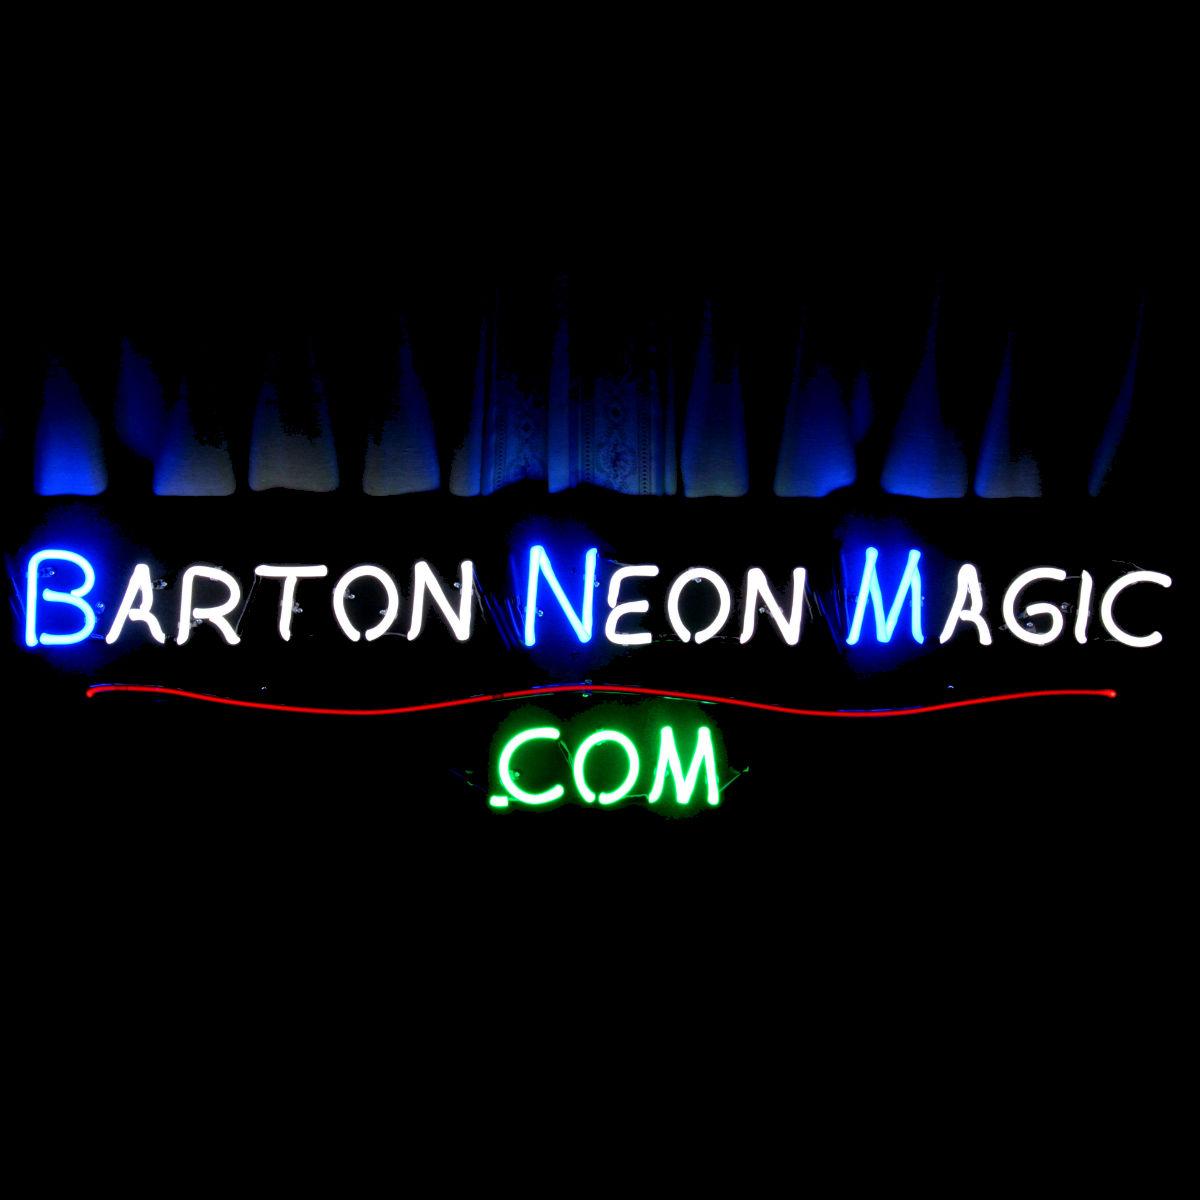 Fine Quality Designer Neon Lighting by John Barton - BartonNeonMagic.com